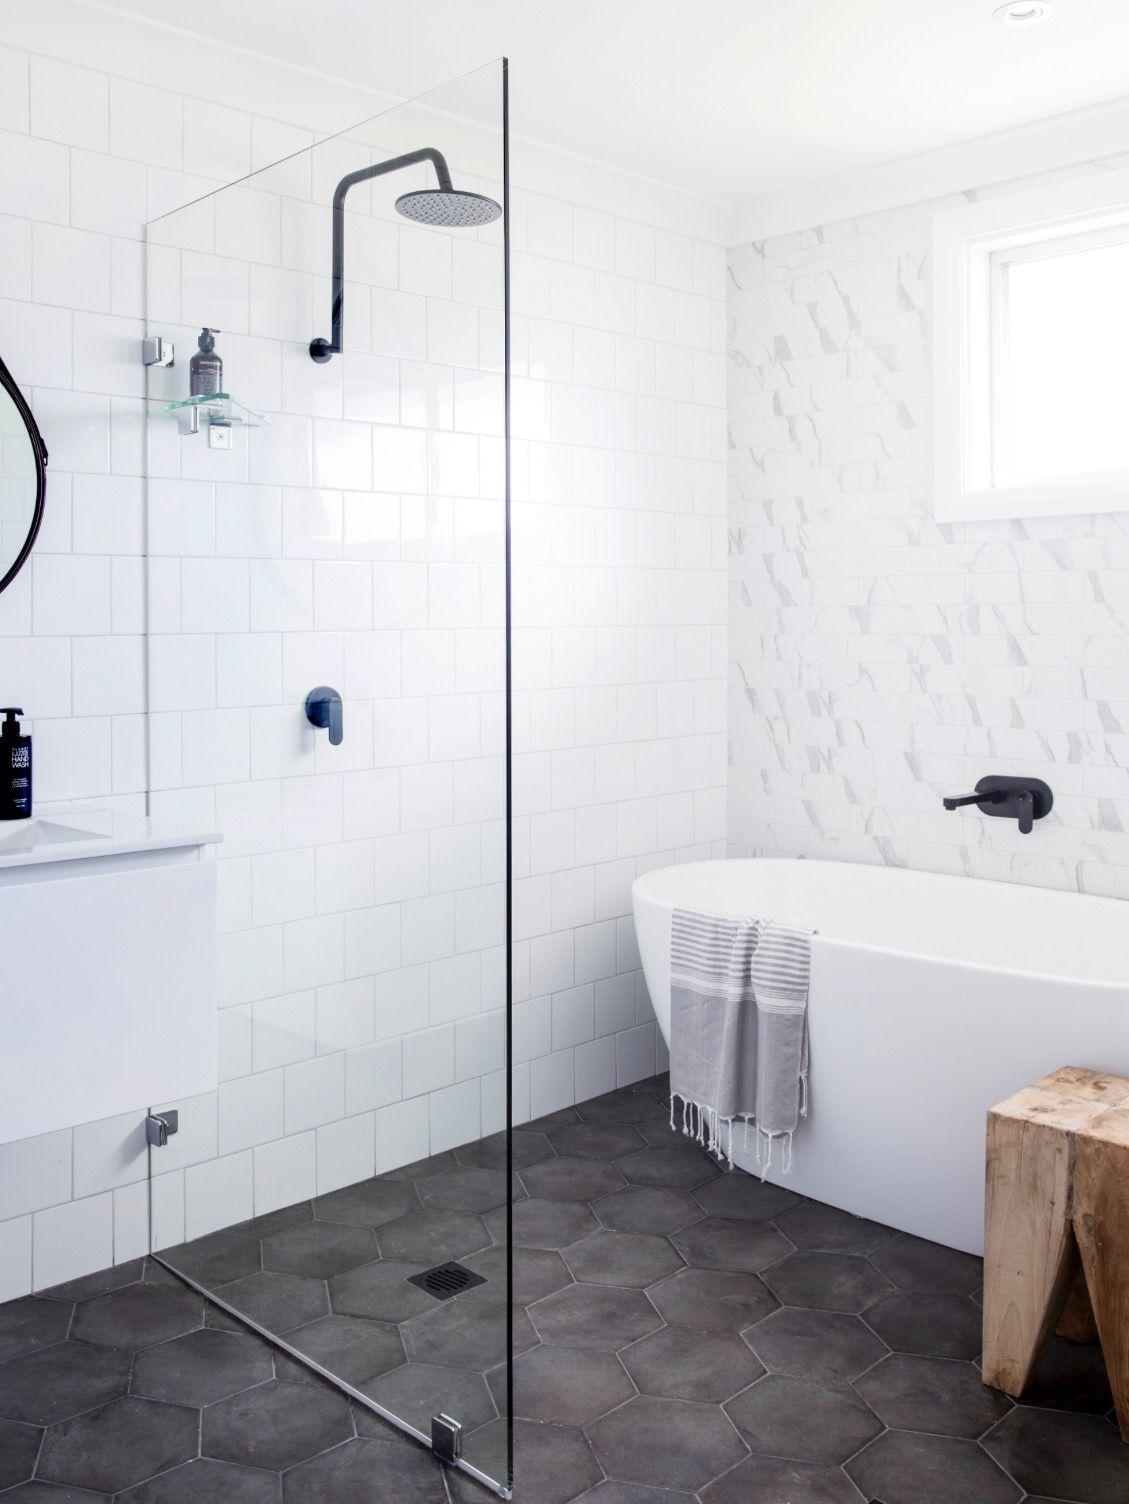 Hexagonal bathroom floor tiles | Home Reno Inspo | Pinterest | Bath ...